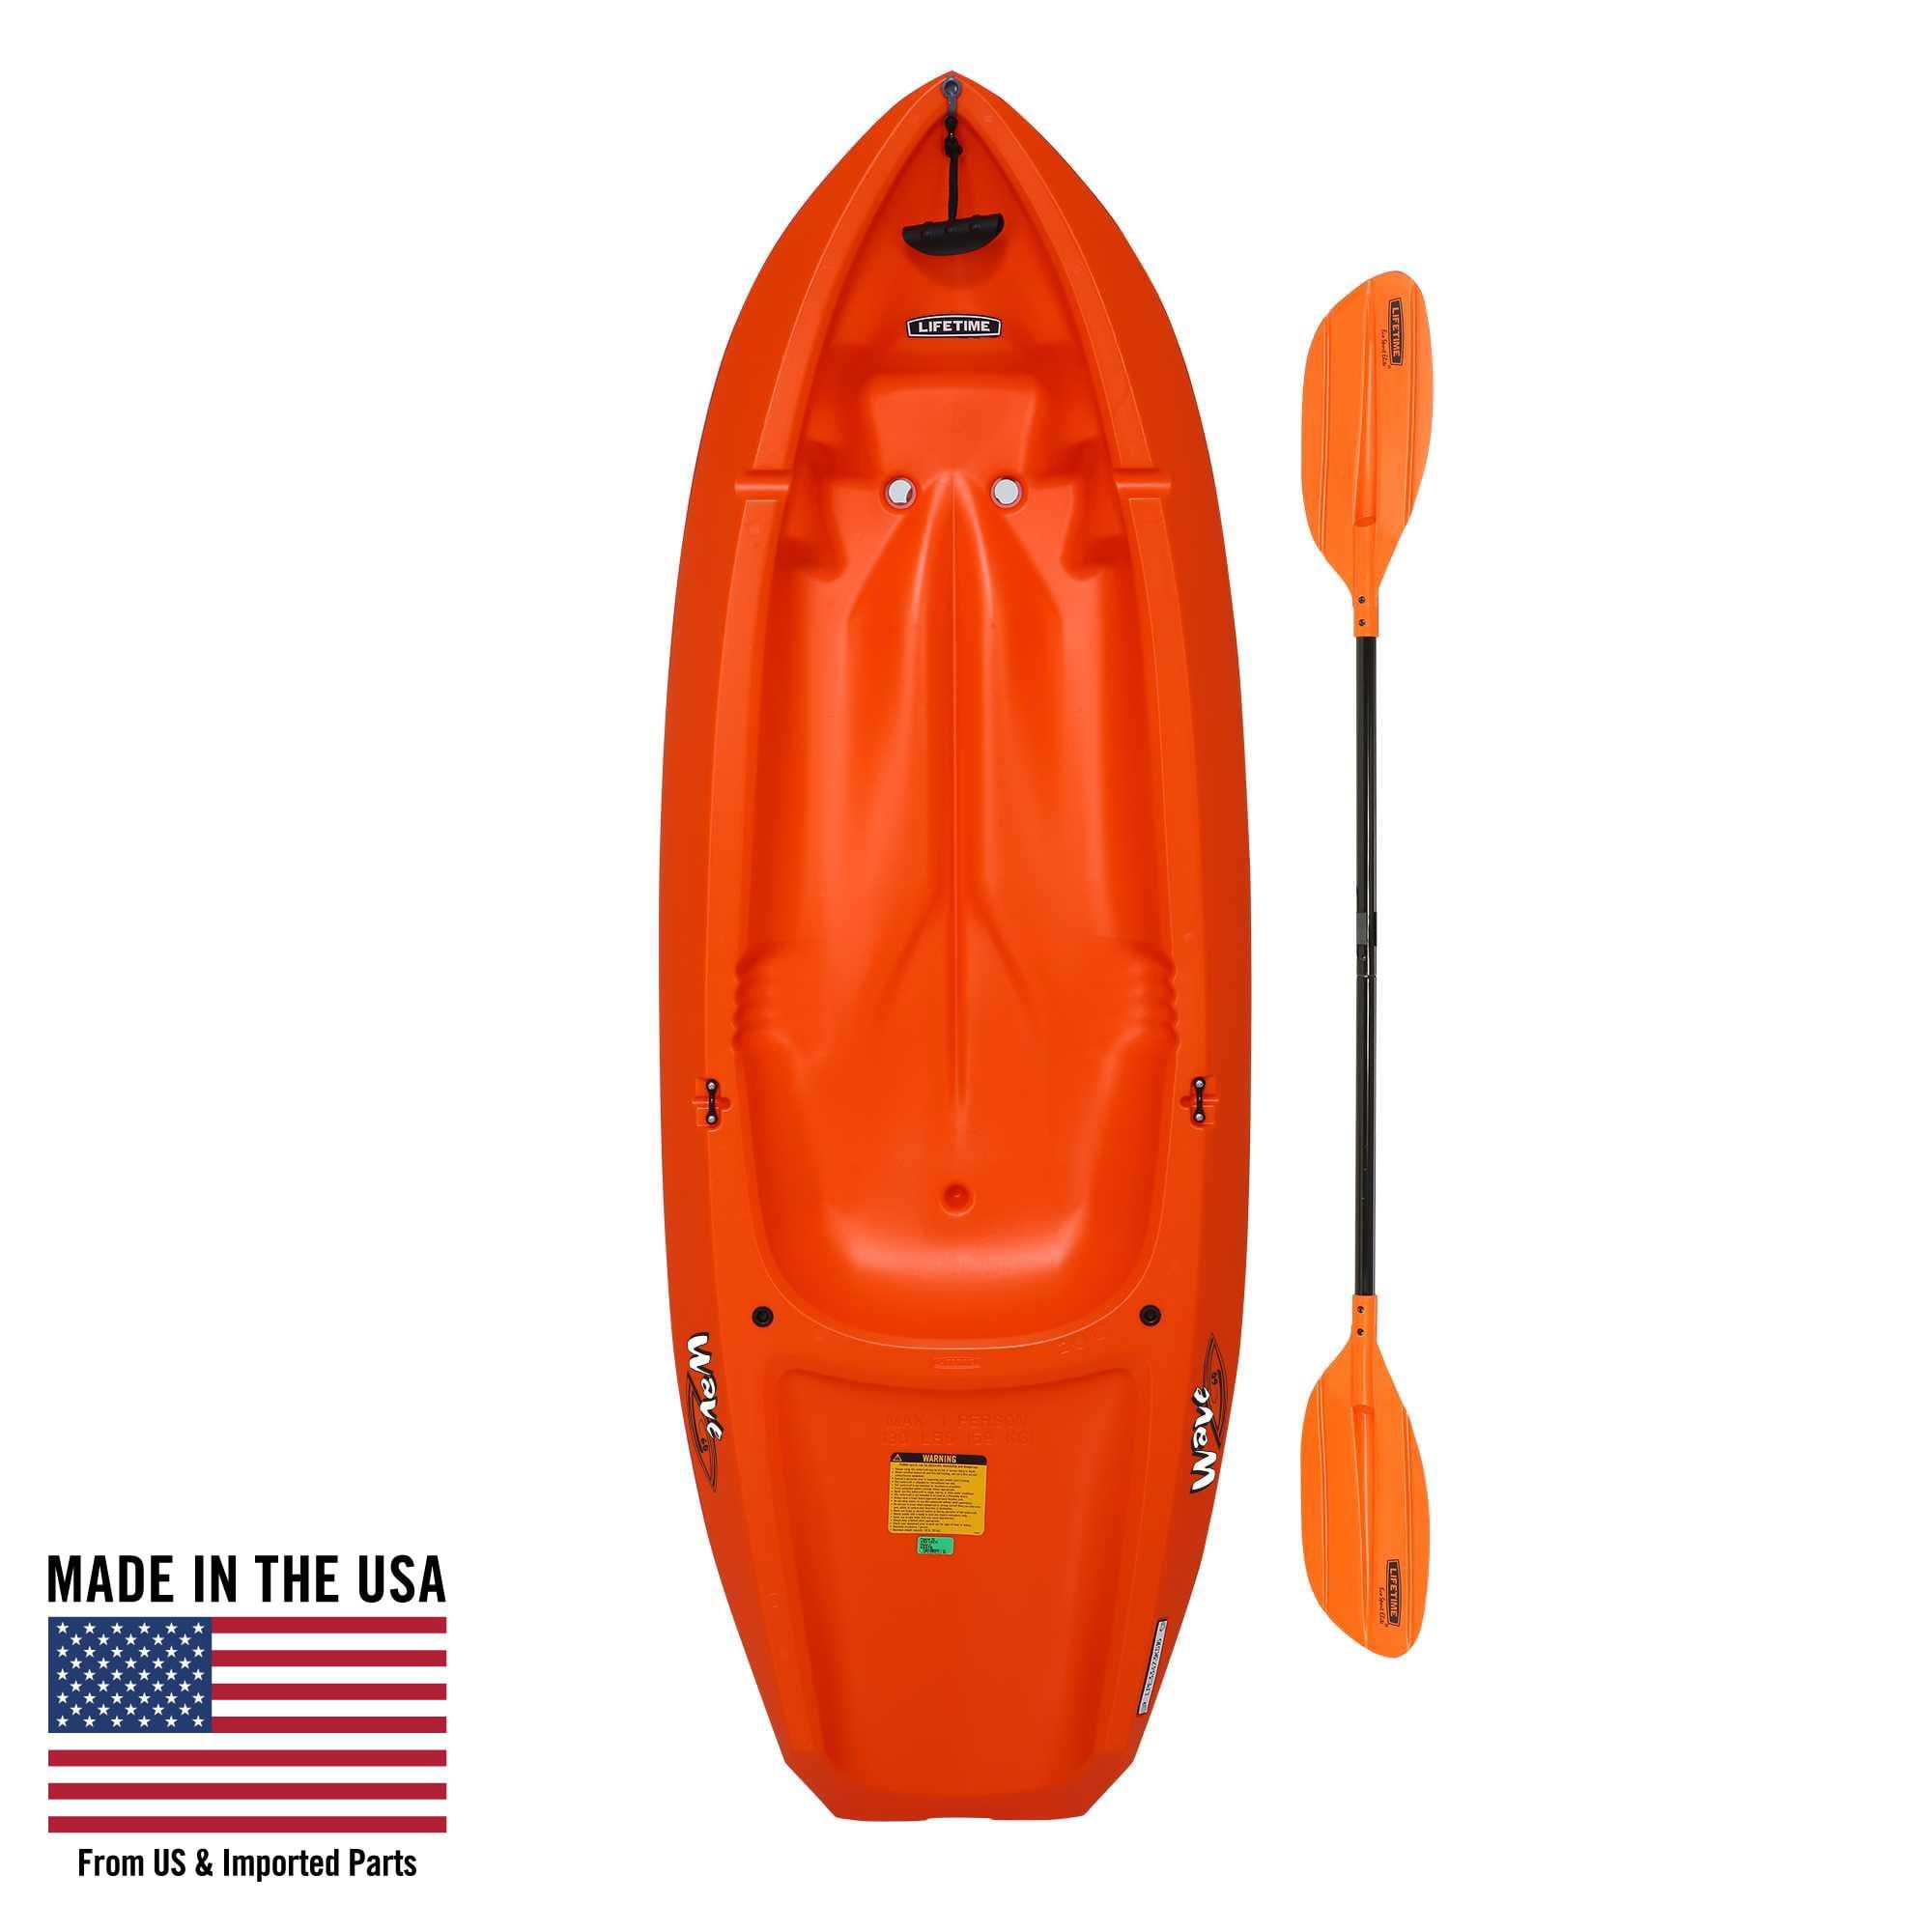 Boats & Water Sports - Walmart.com